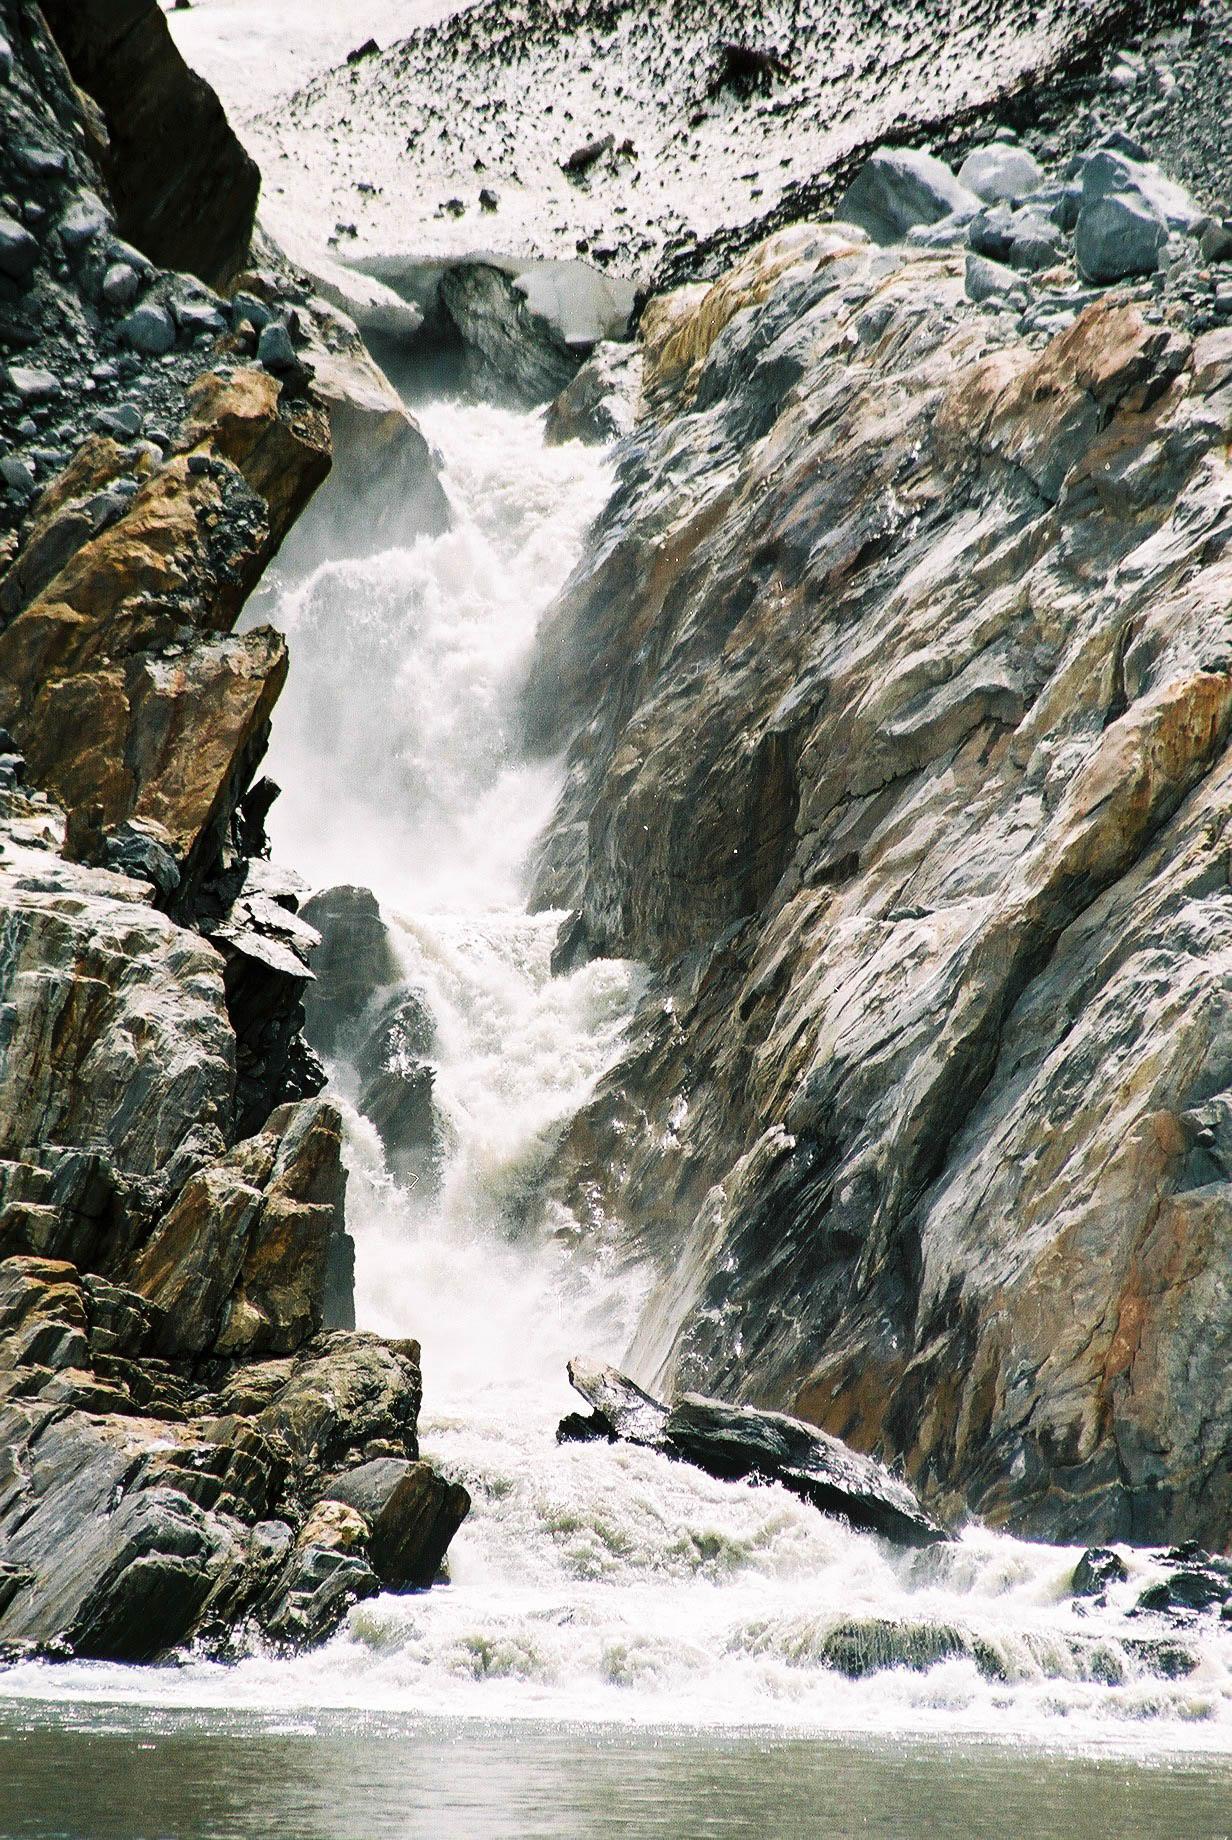 Waterfall at South Sawyer Glacier